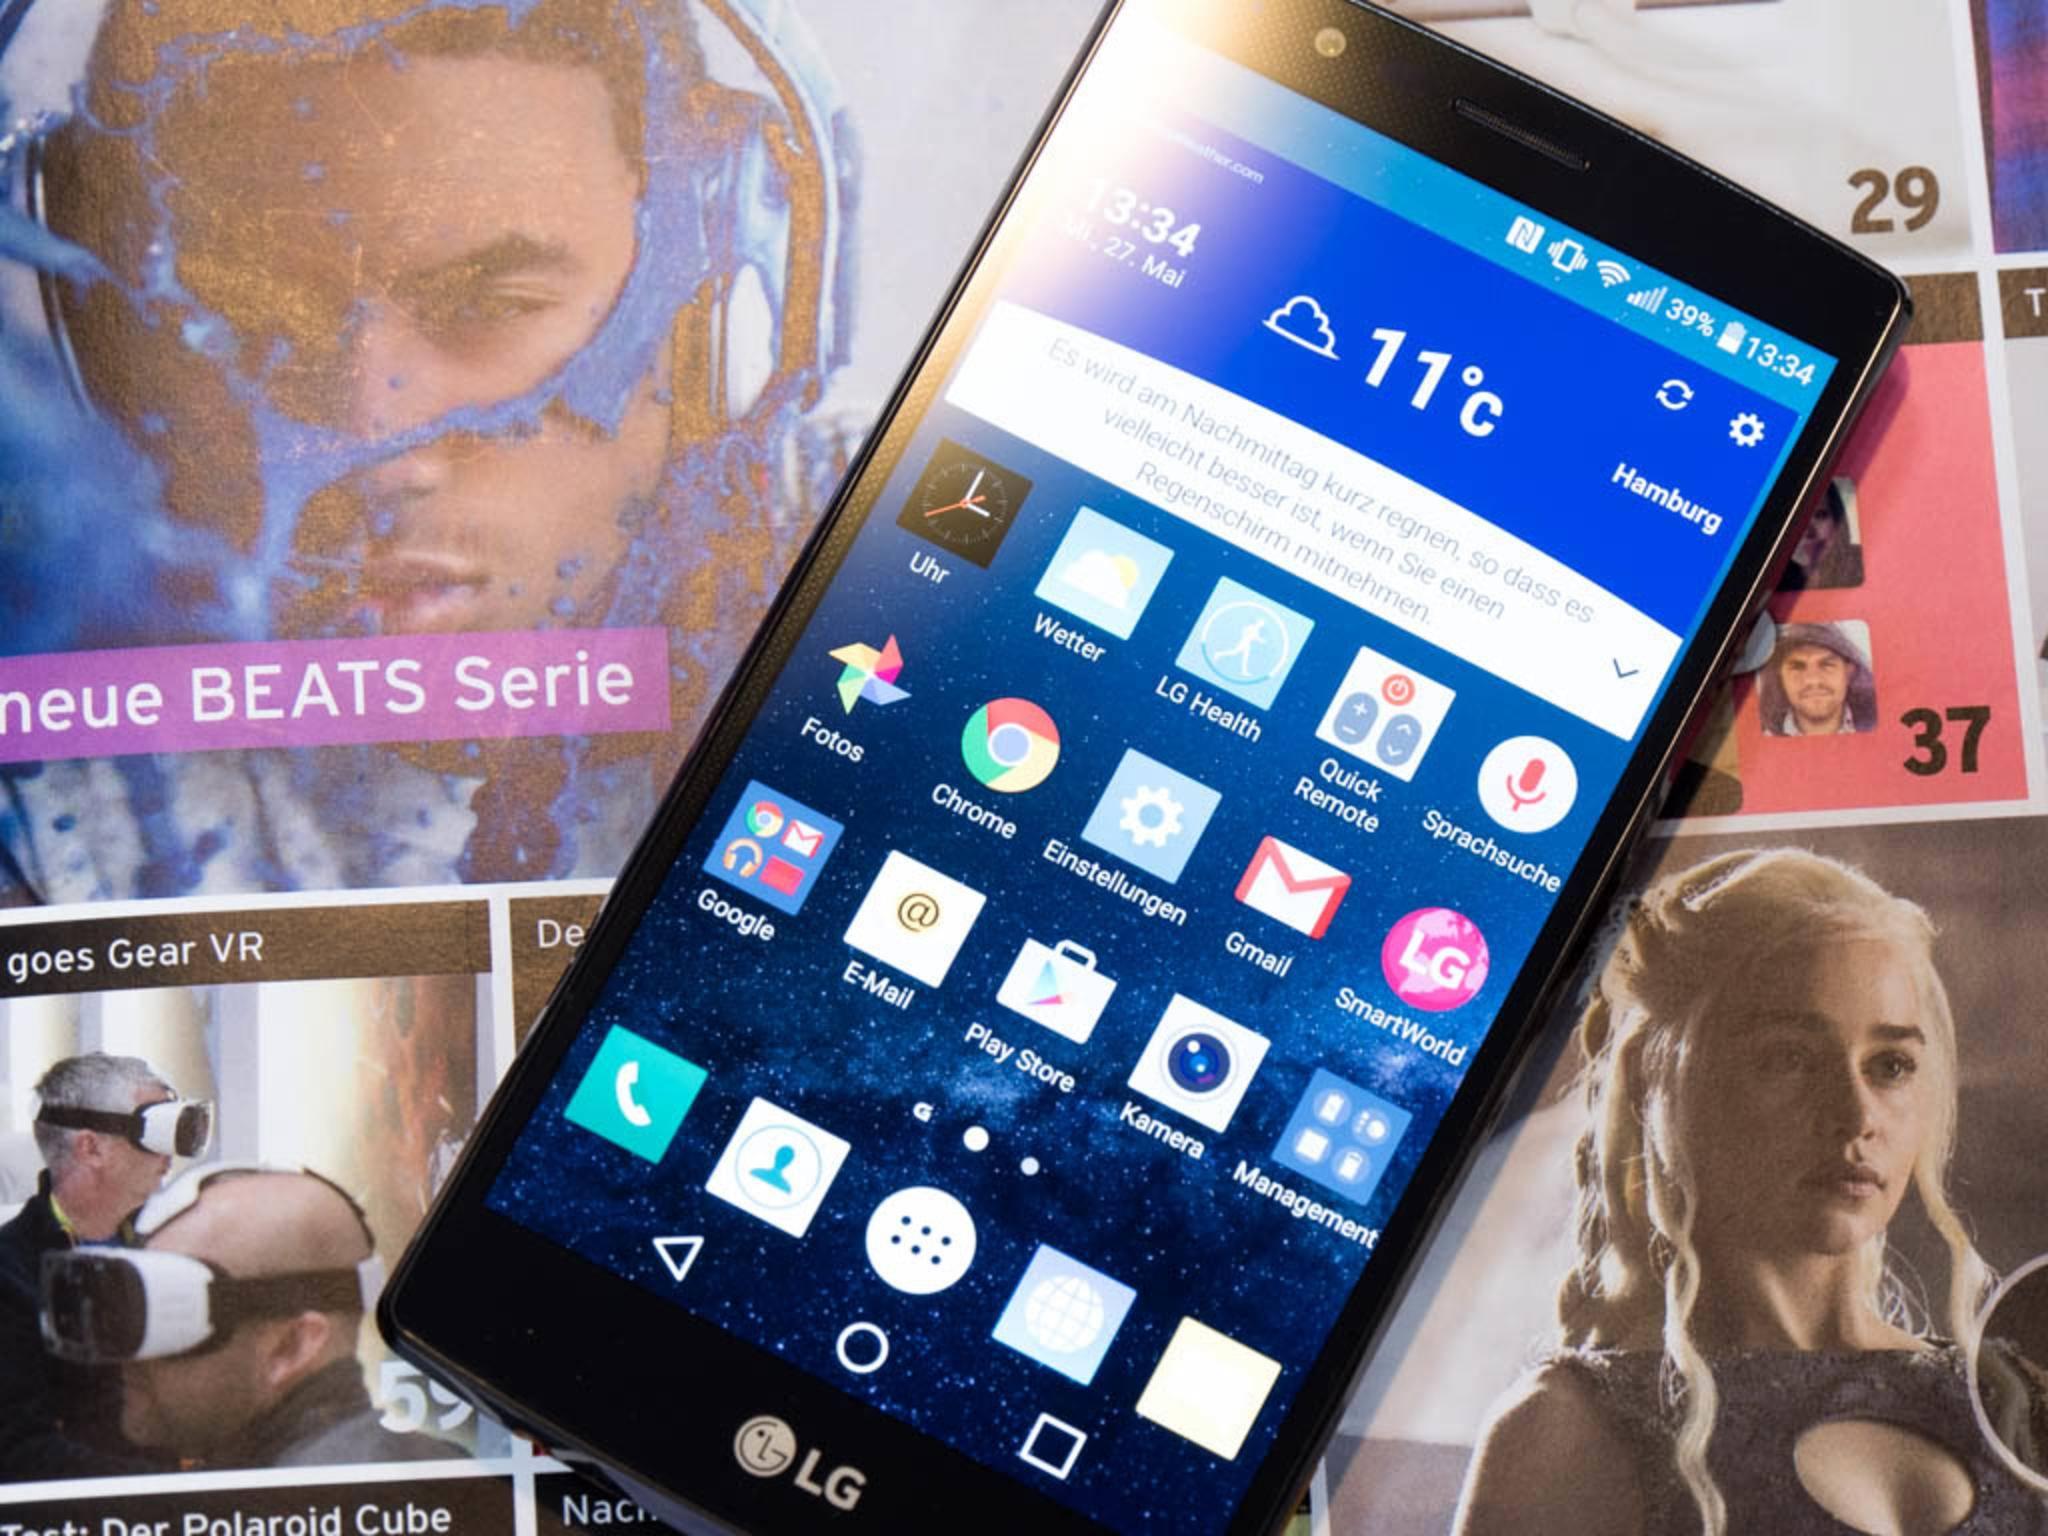 Das LG G4 bekommt als erstes Android 6.0 Marshmallow.